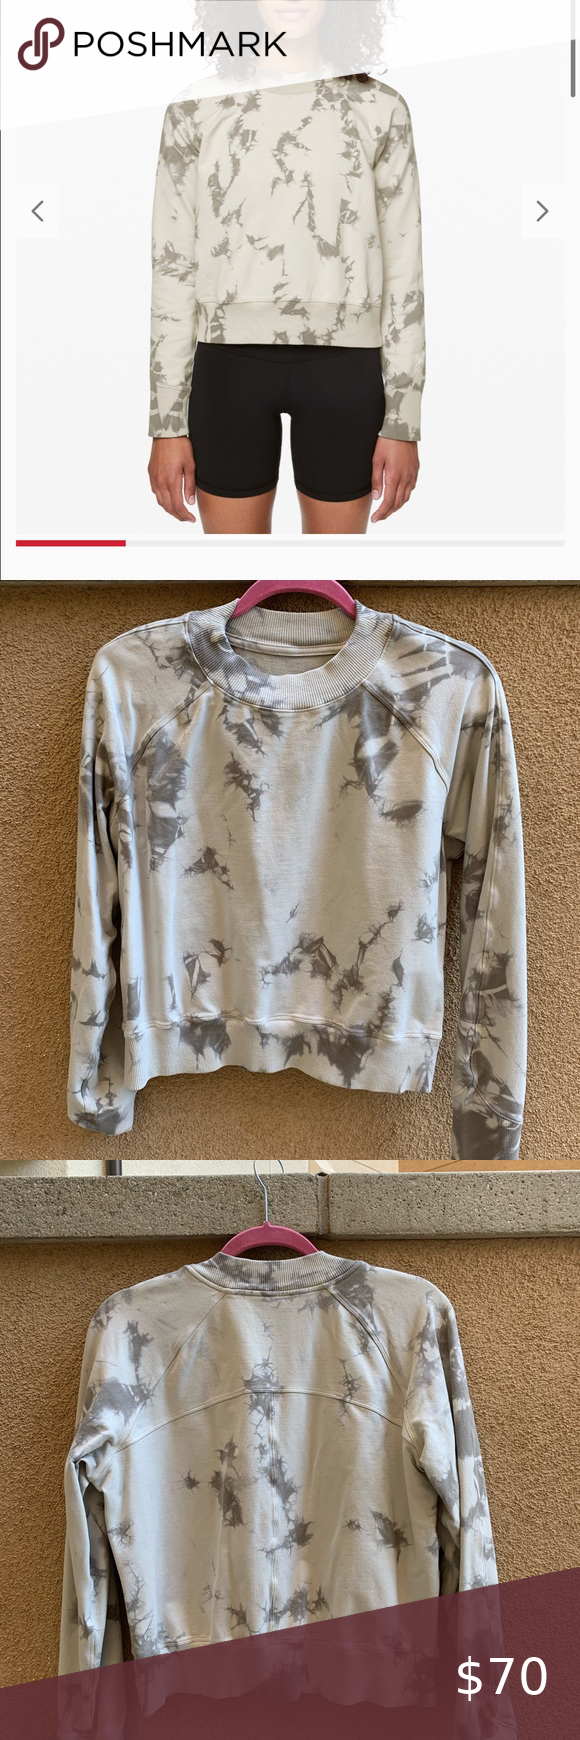 Lululemon Ready To Roll Crew Sweatshirt Crew Sweatshirts Sweatshirts Comfy Sweatshirt [ 1740 x 580 Pixel ]